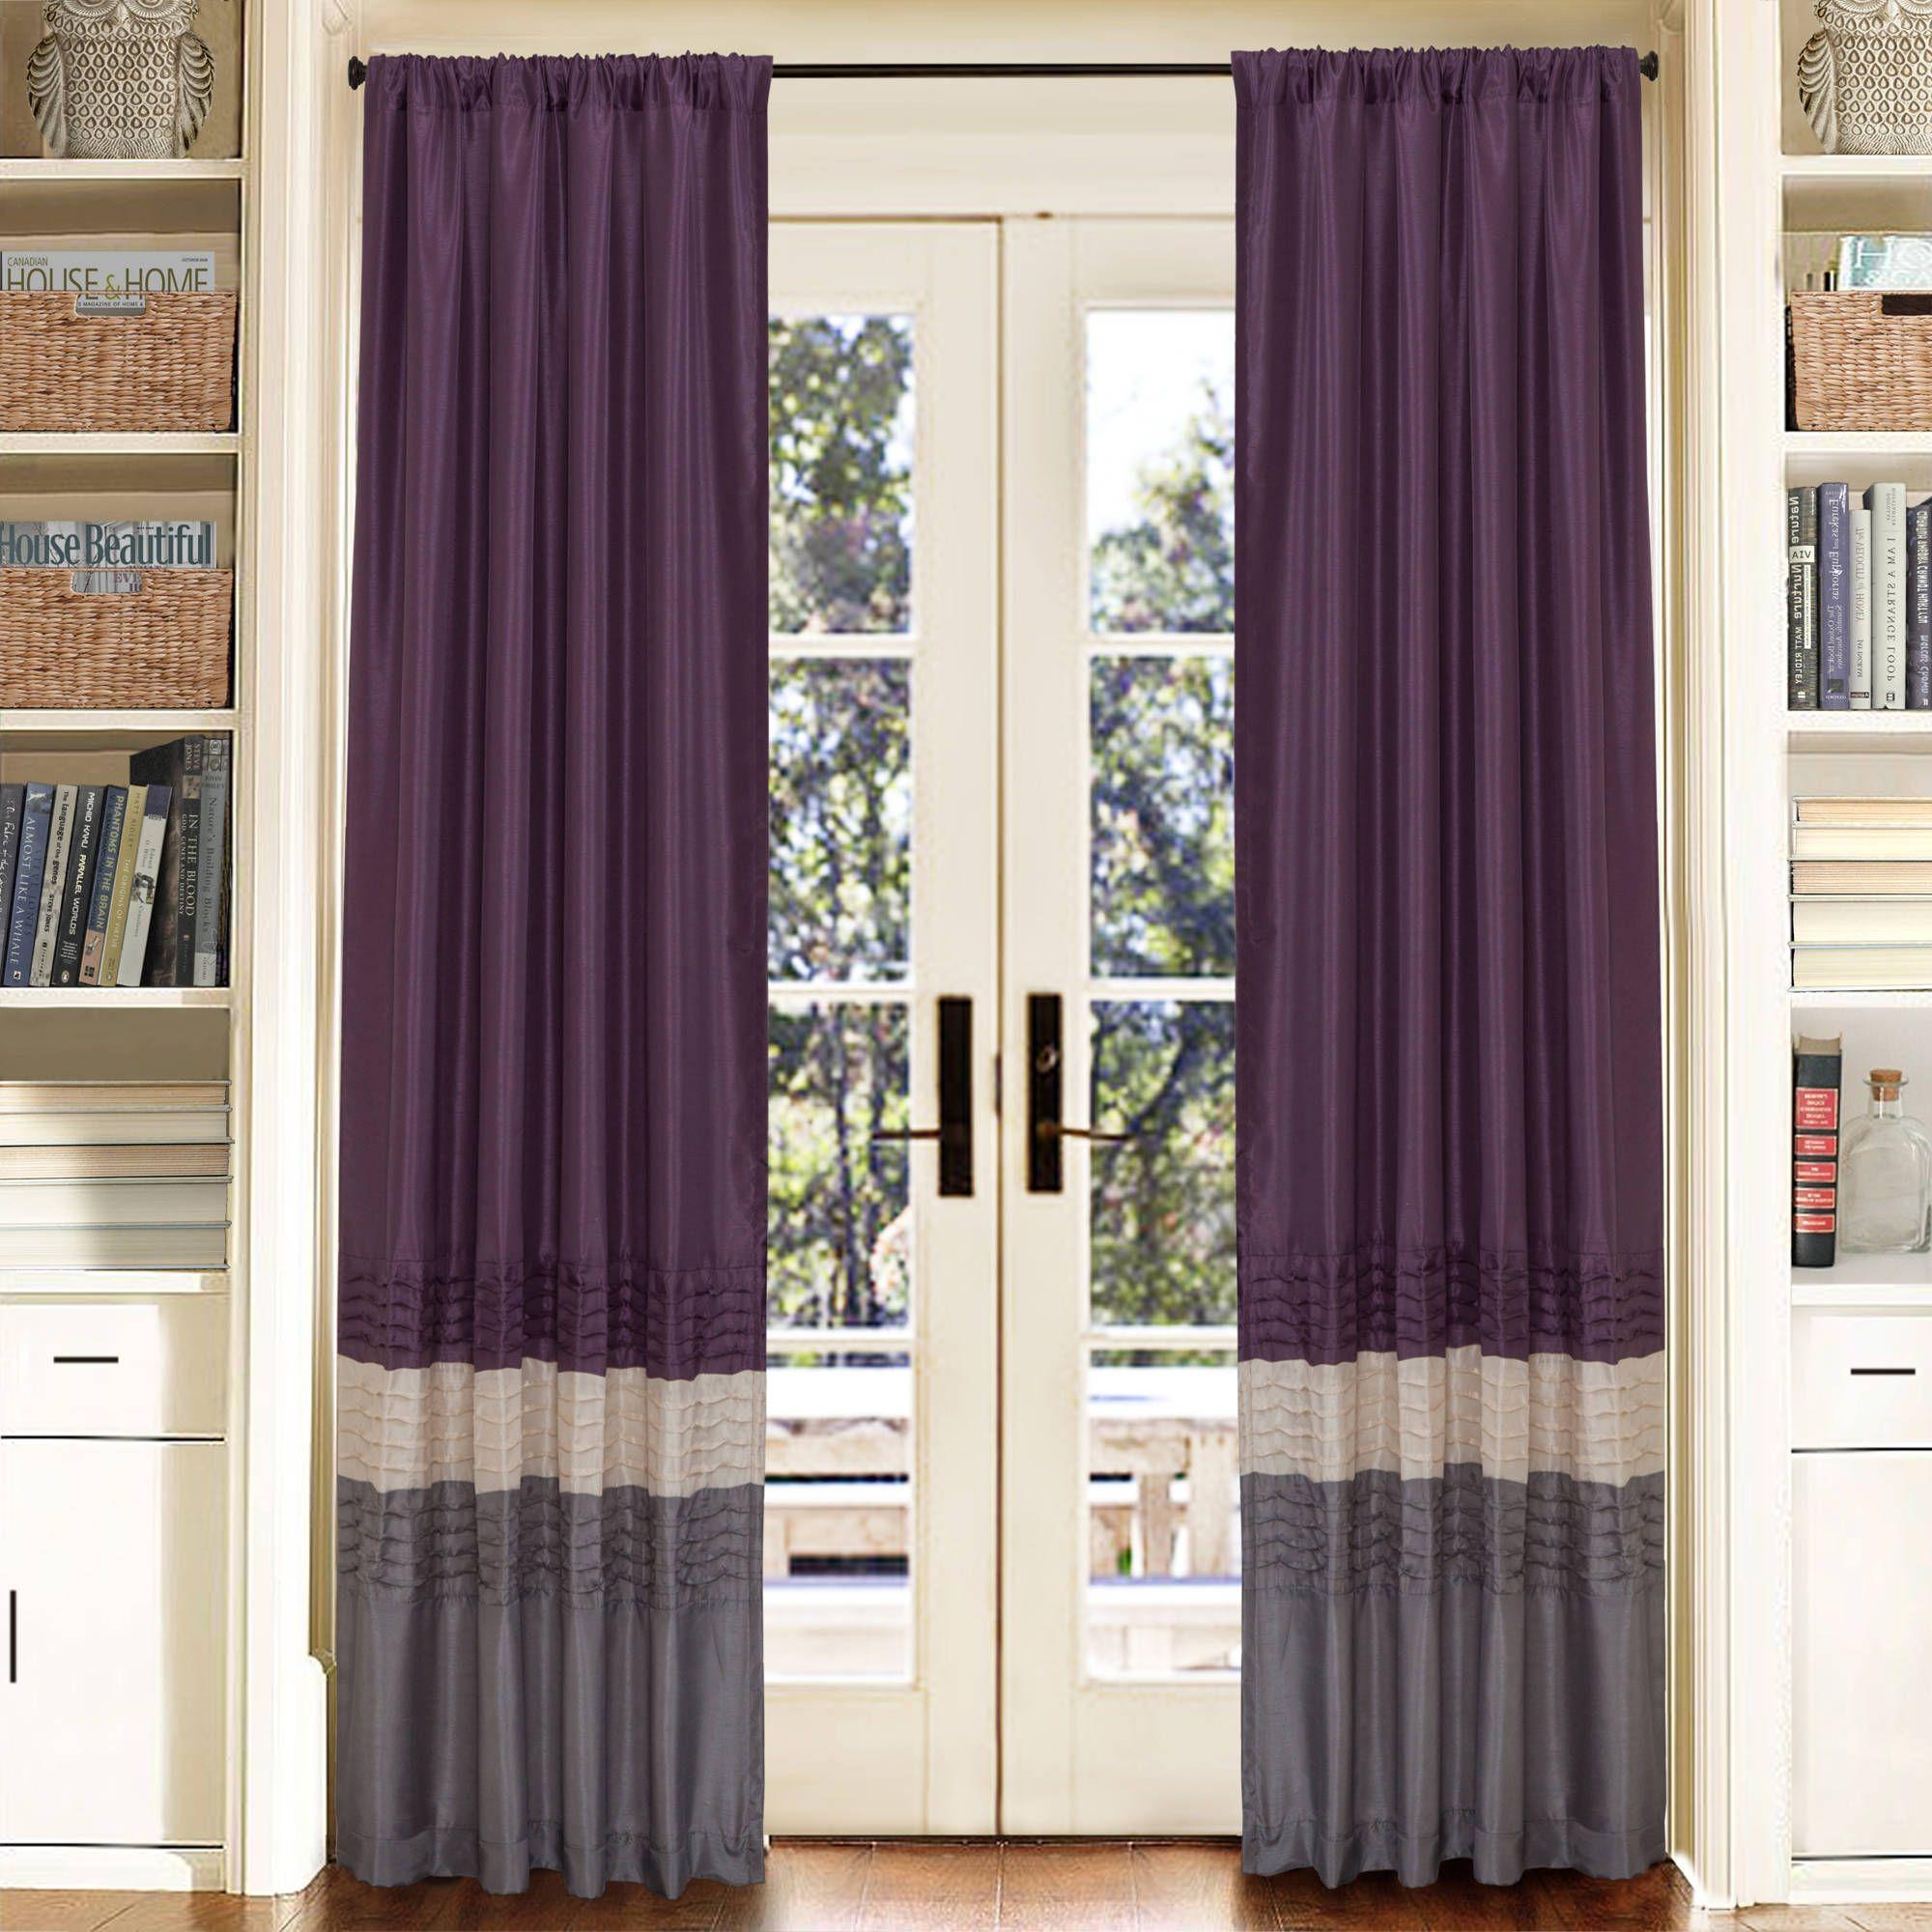 Mia Gray Purple Window Curtain Set 54x84 Walmart Com In 2020 Purple Window Curtains Purple Curtains Window Curtains